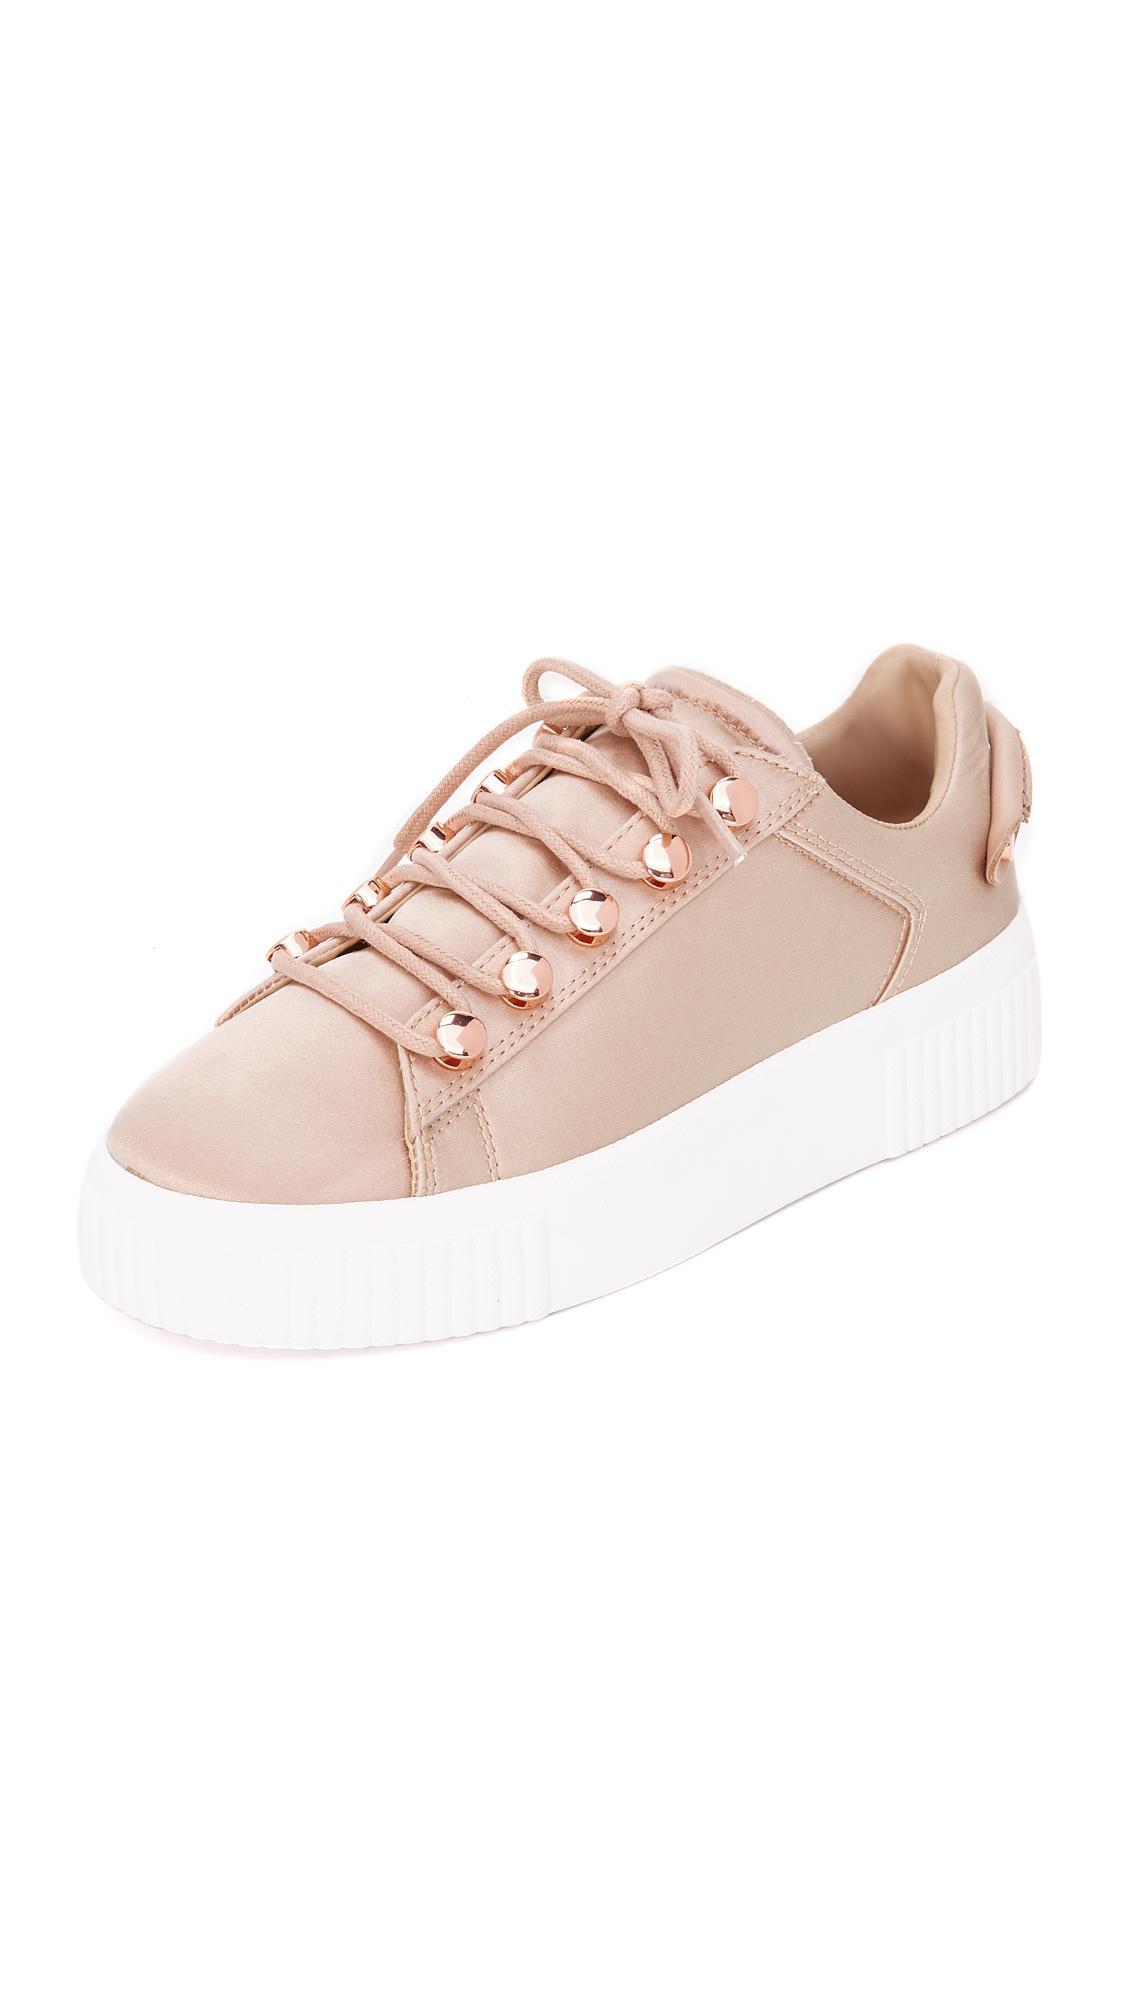 KENDALL + KYLIE Rae3 Satin Platform Sneakers QK3MI9mQ3